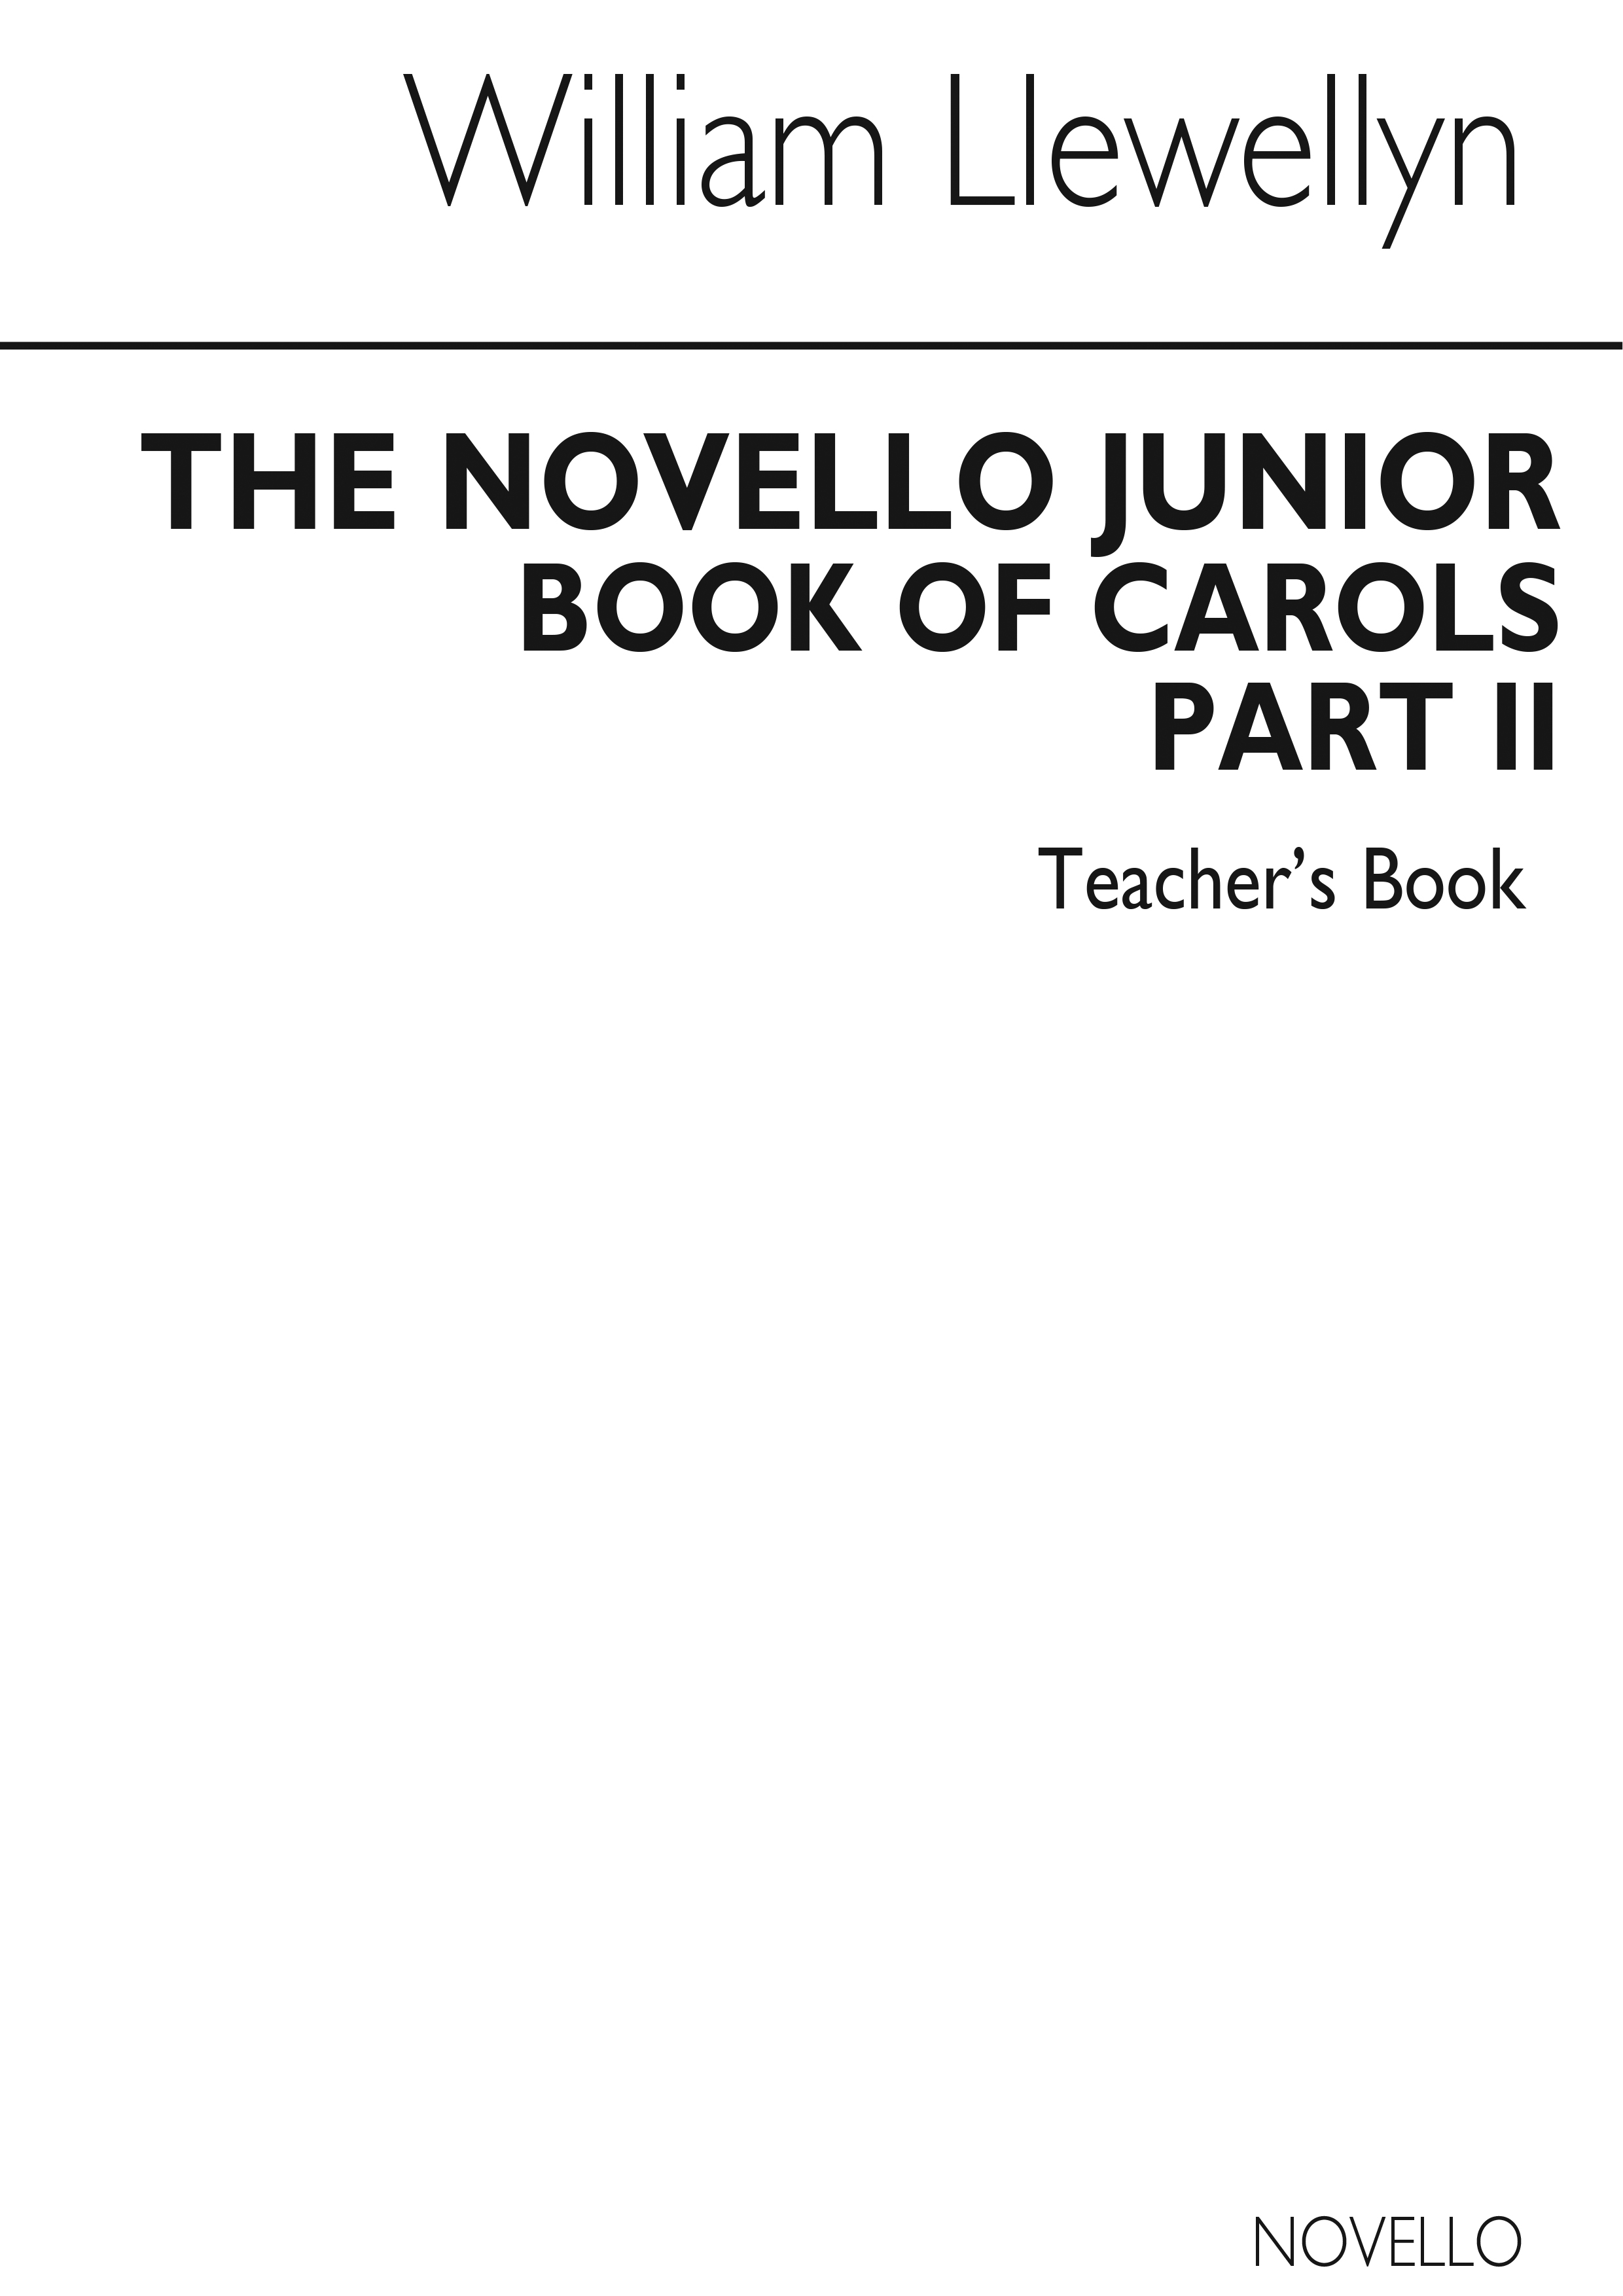 Llewellyn: The Novello Junior Book Of Carols Teacher's Book 2: 2-Part Choir: